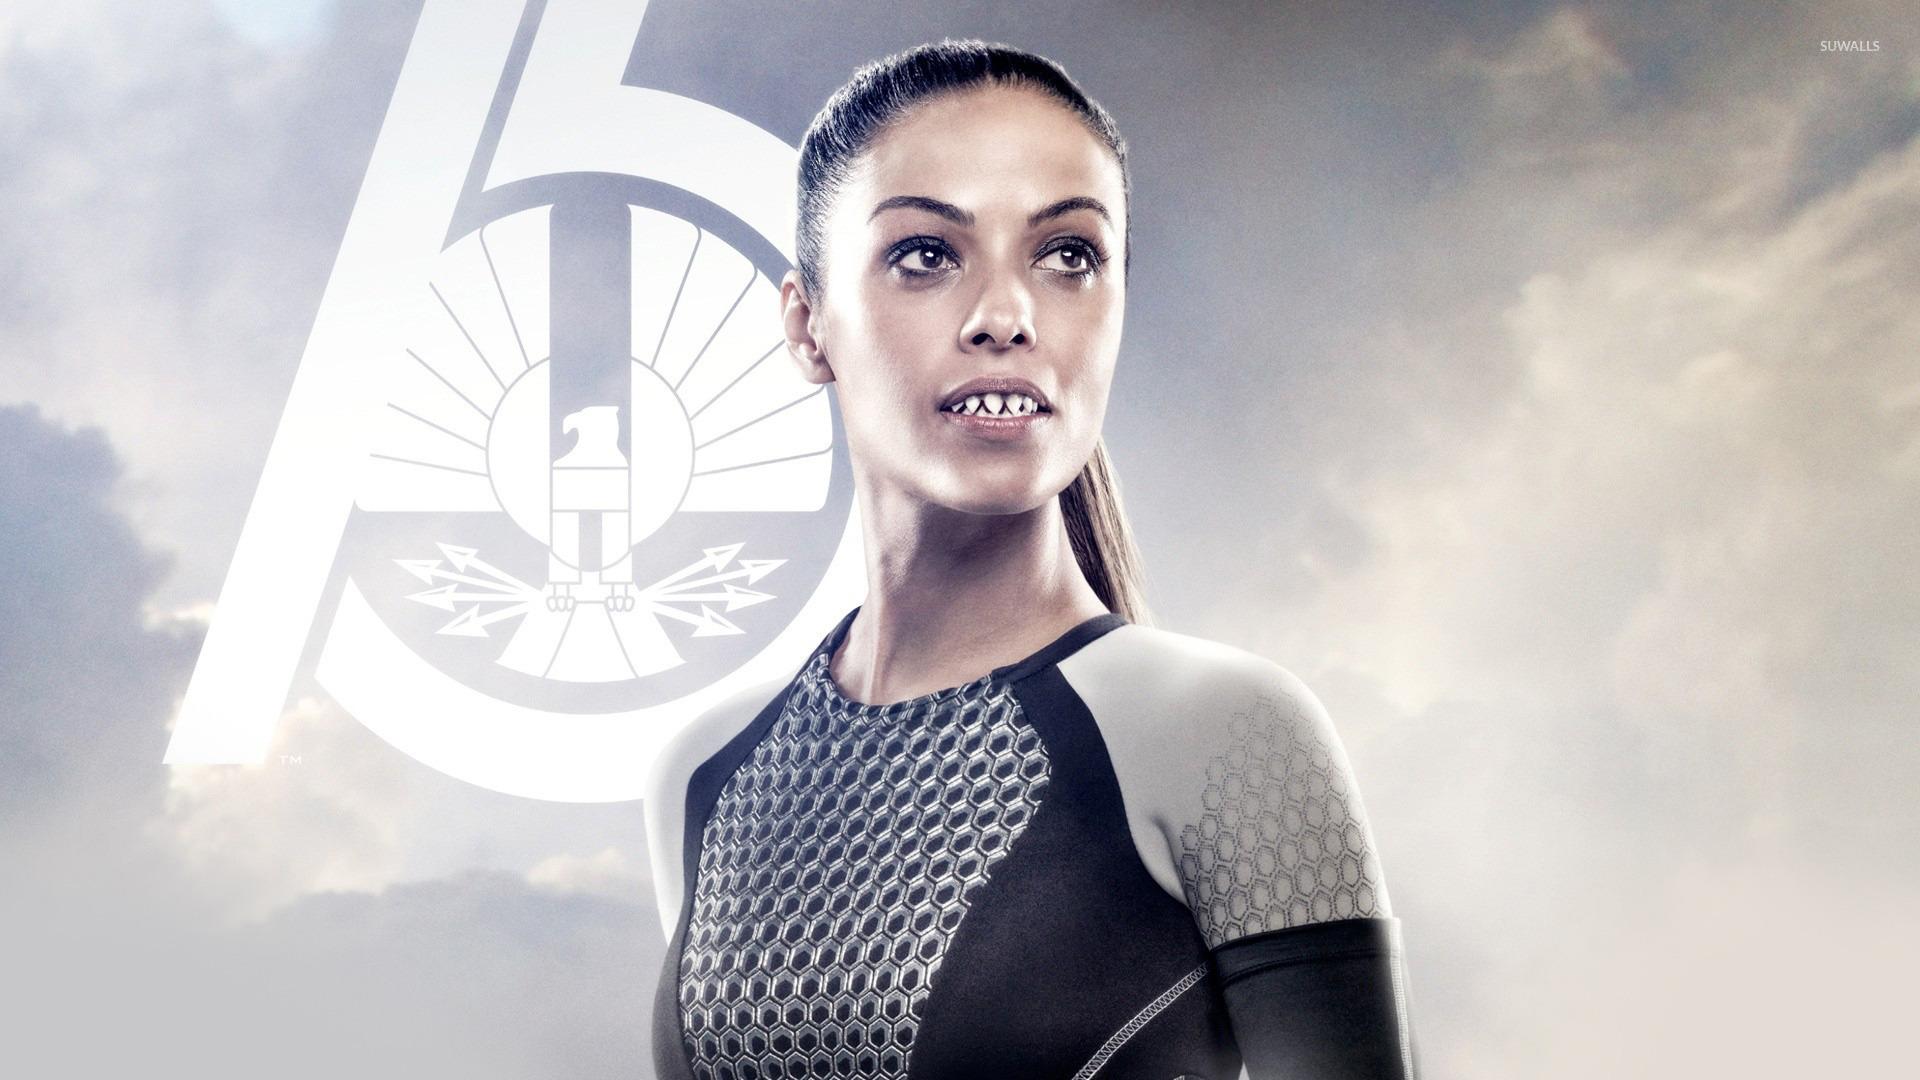 Enobaria Hunger Games Enobaria - The Hunger ...